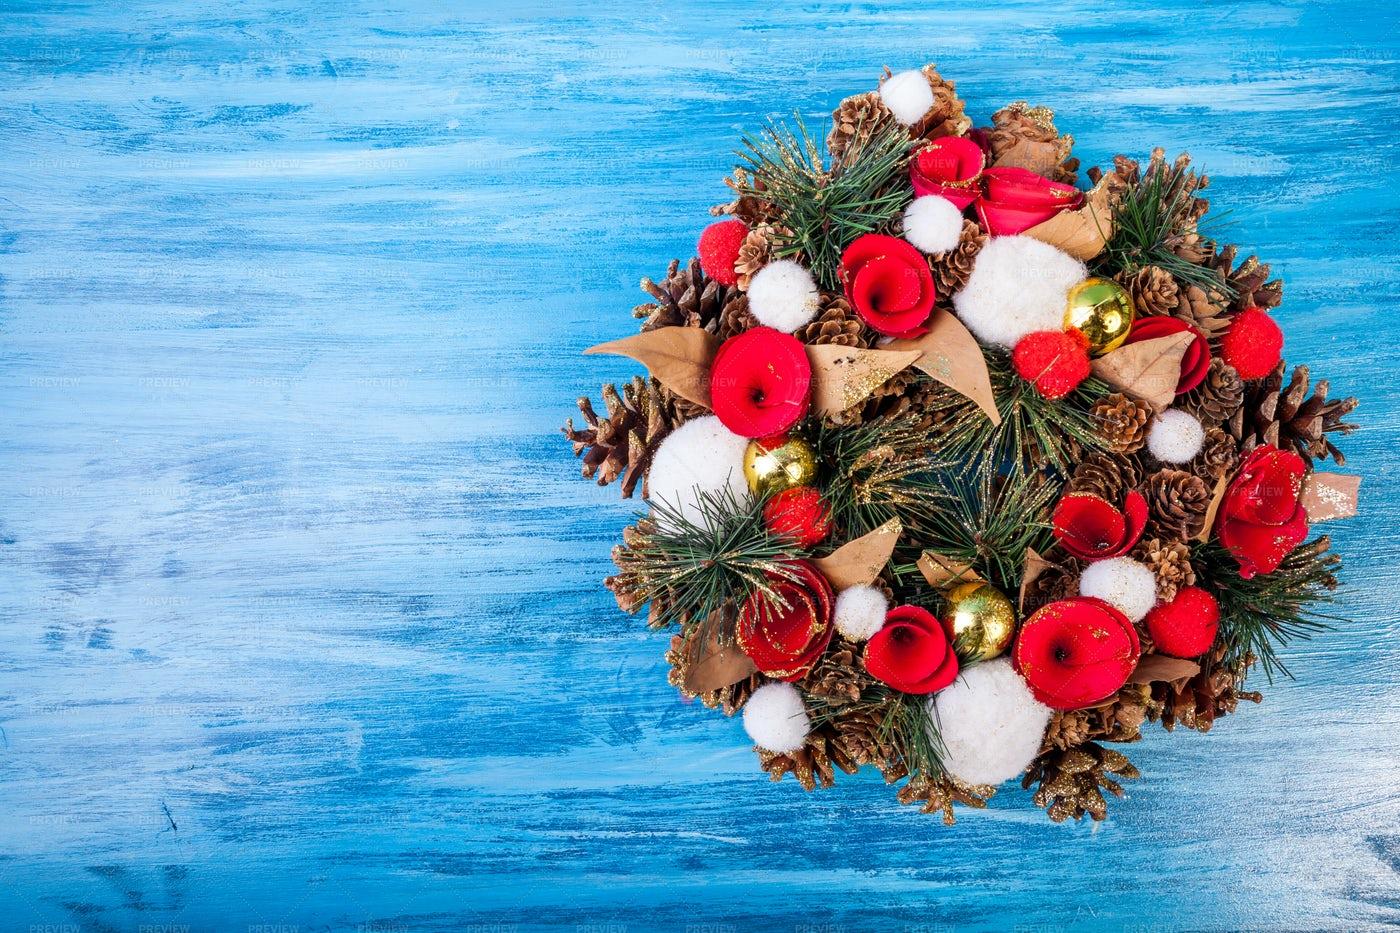 Christmas Wreath On Blue Background: Stock Photos